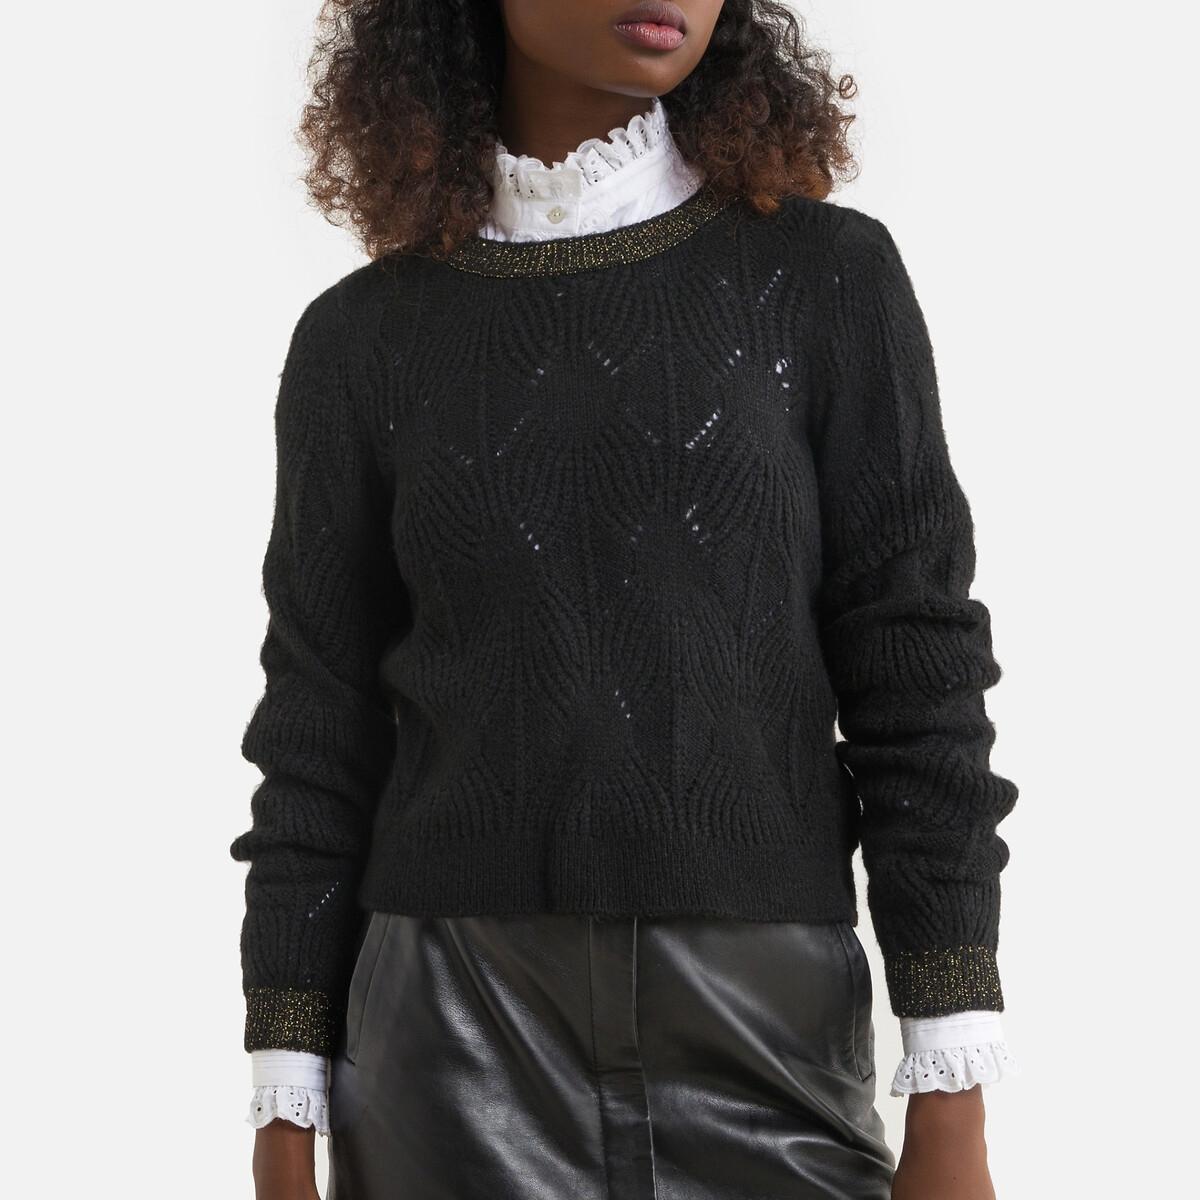 Фото - Пуловер LaRedoute Из тонкого ажурного трикотажа XS черный пуловер laredoute с воротником стойкой из ажурного трикотажа пуантель m каштановый